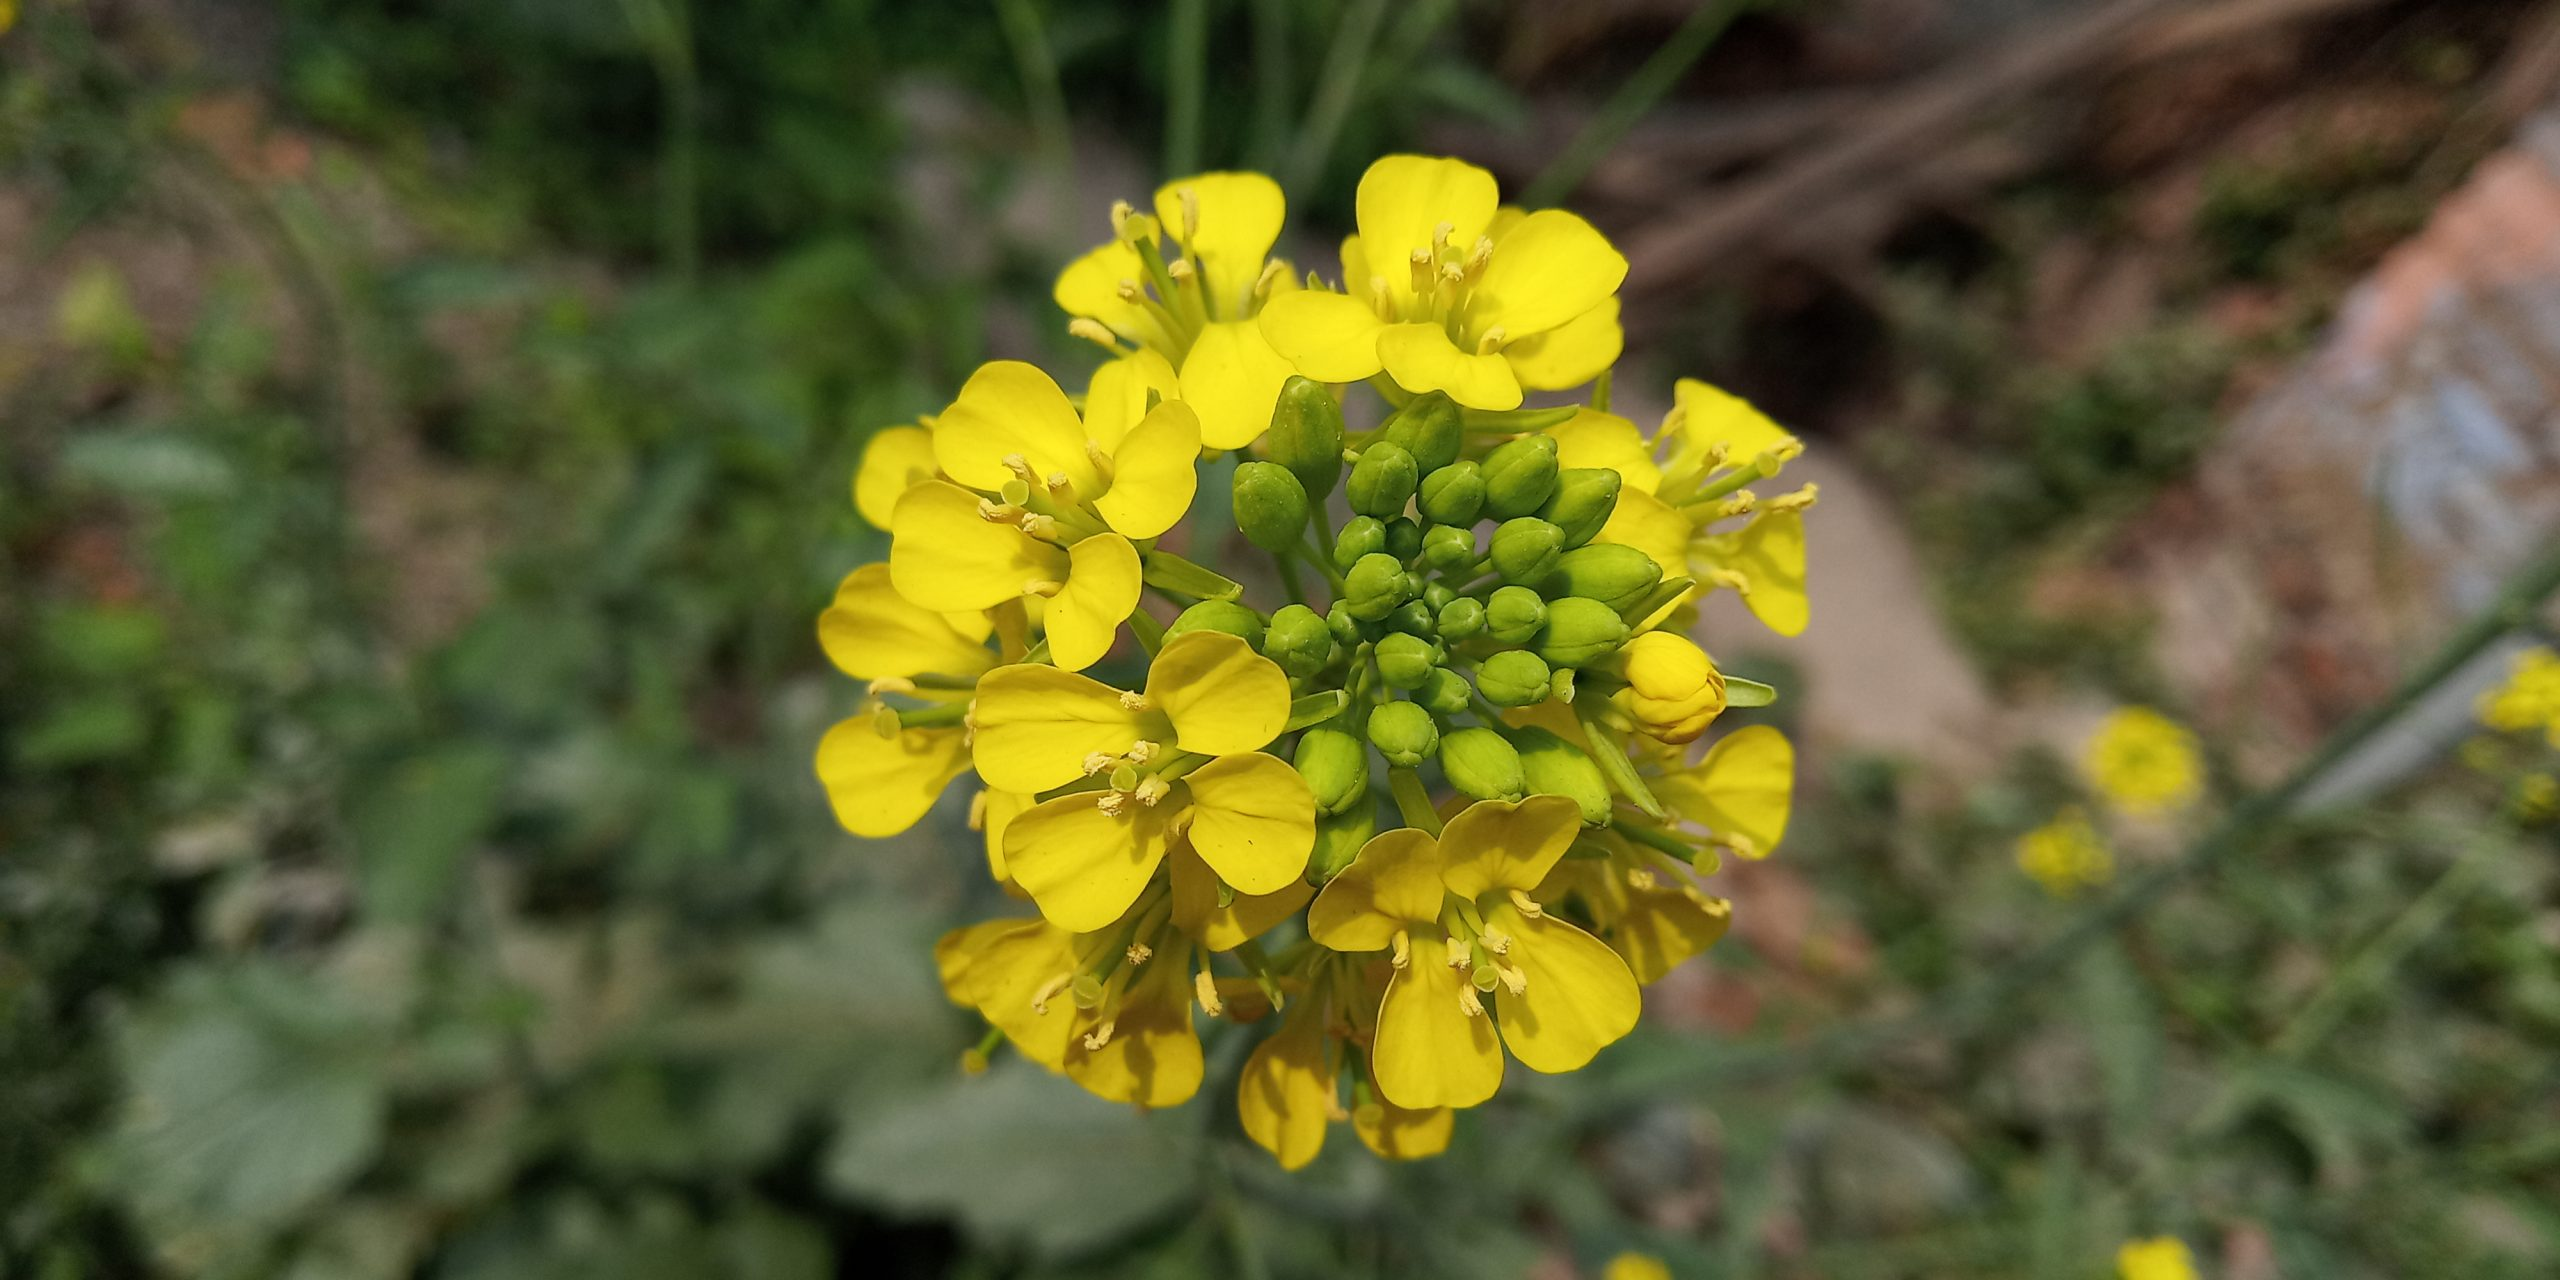 Mustard plant flower